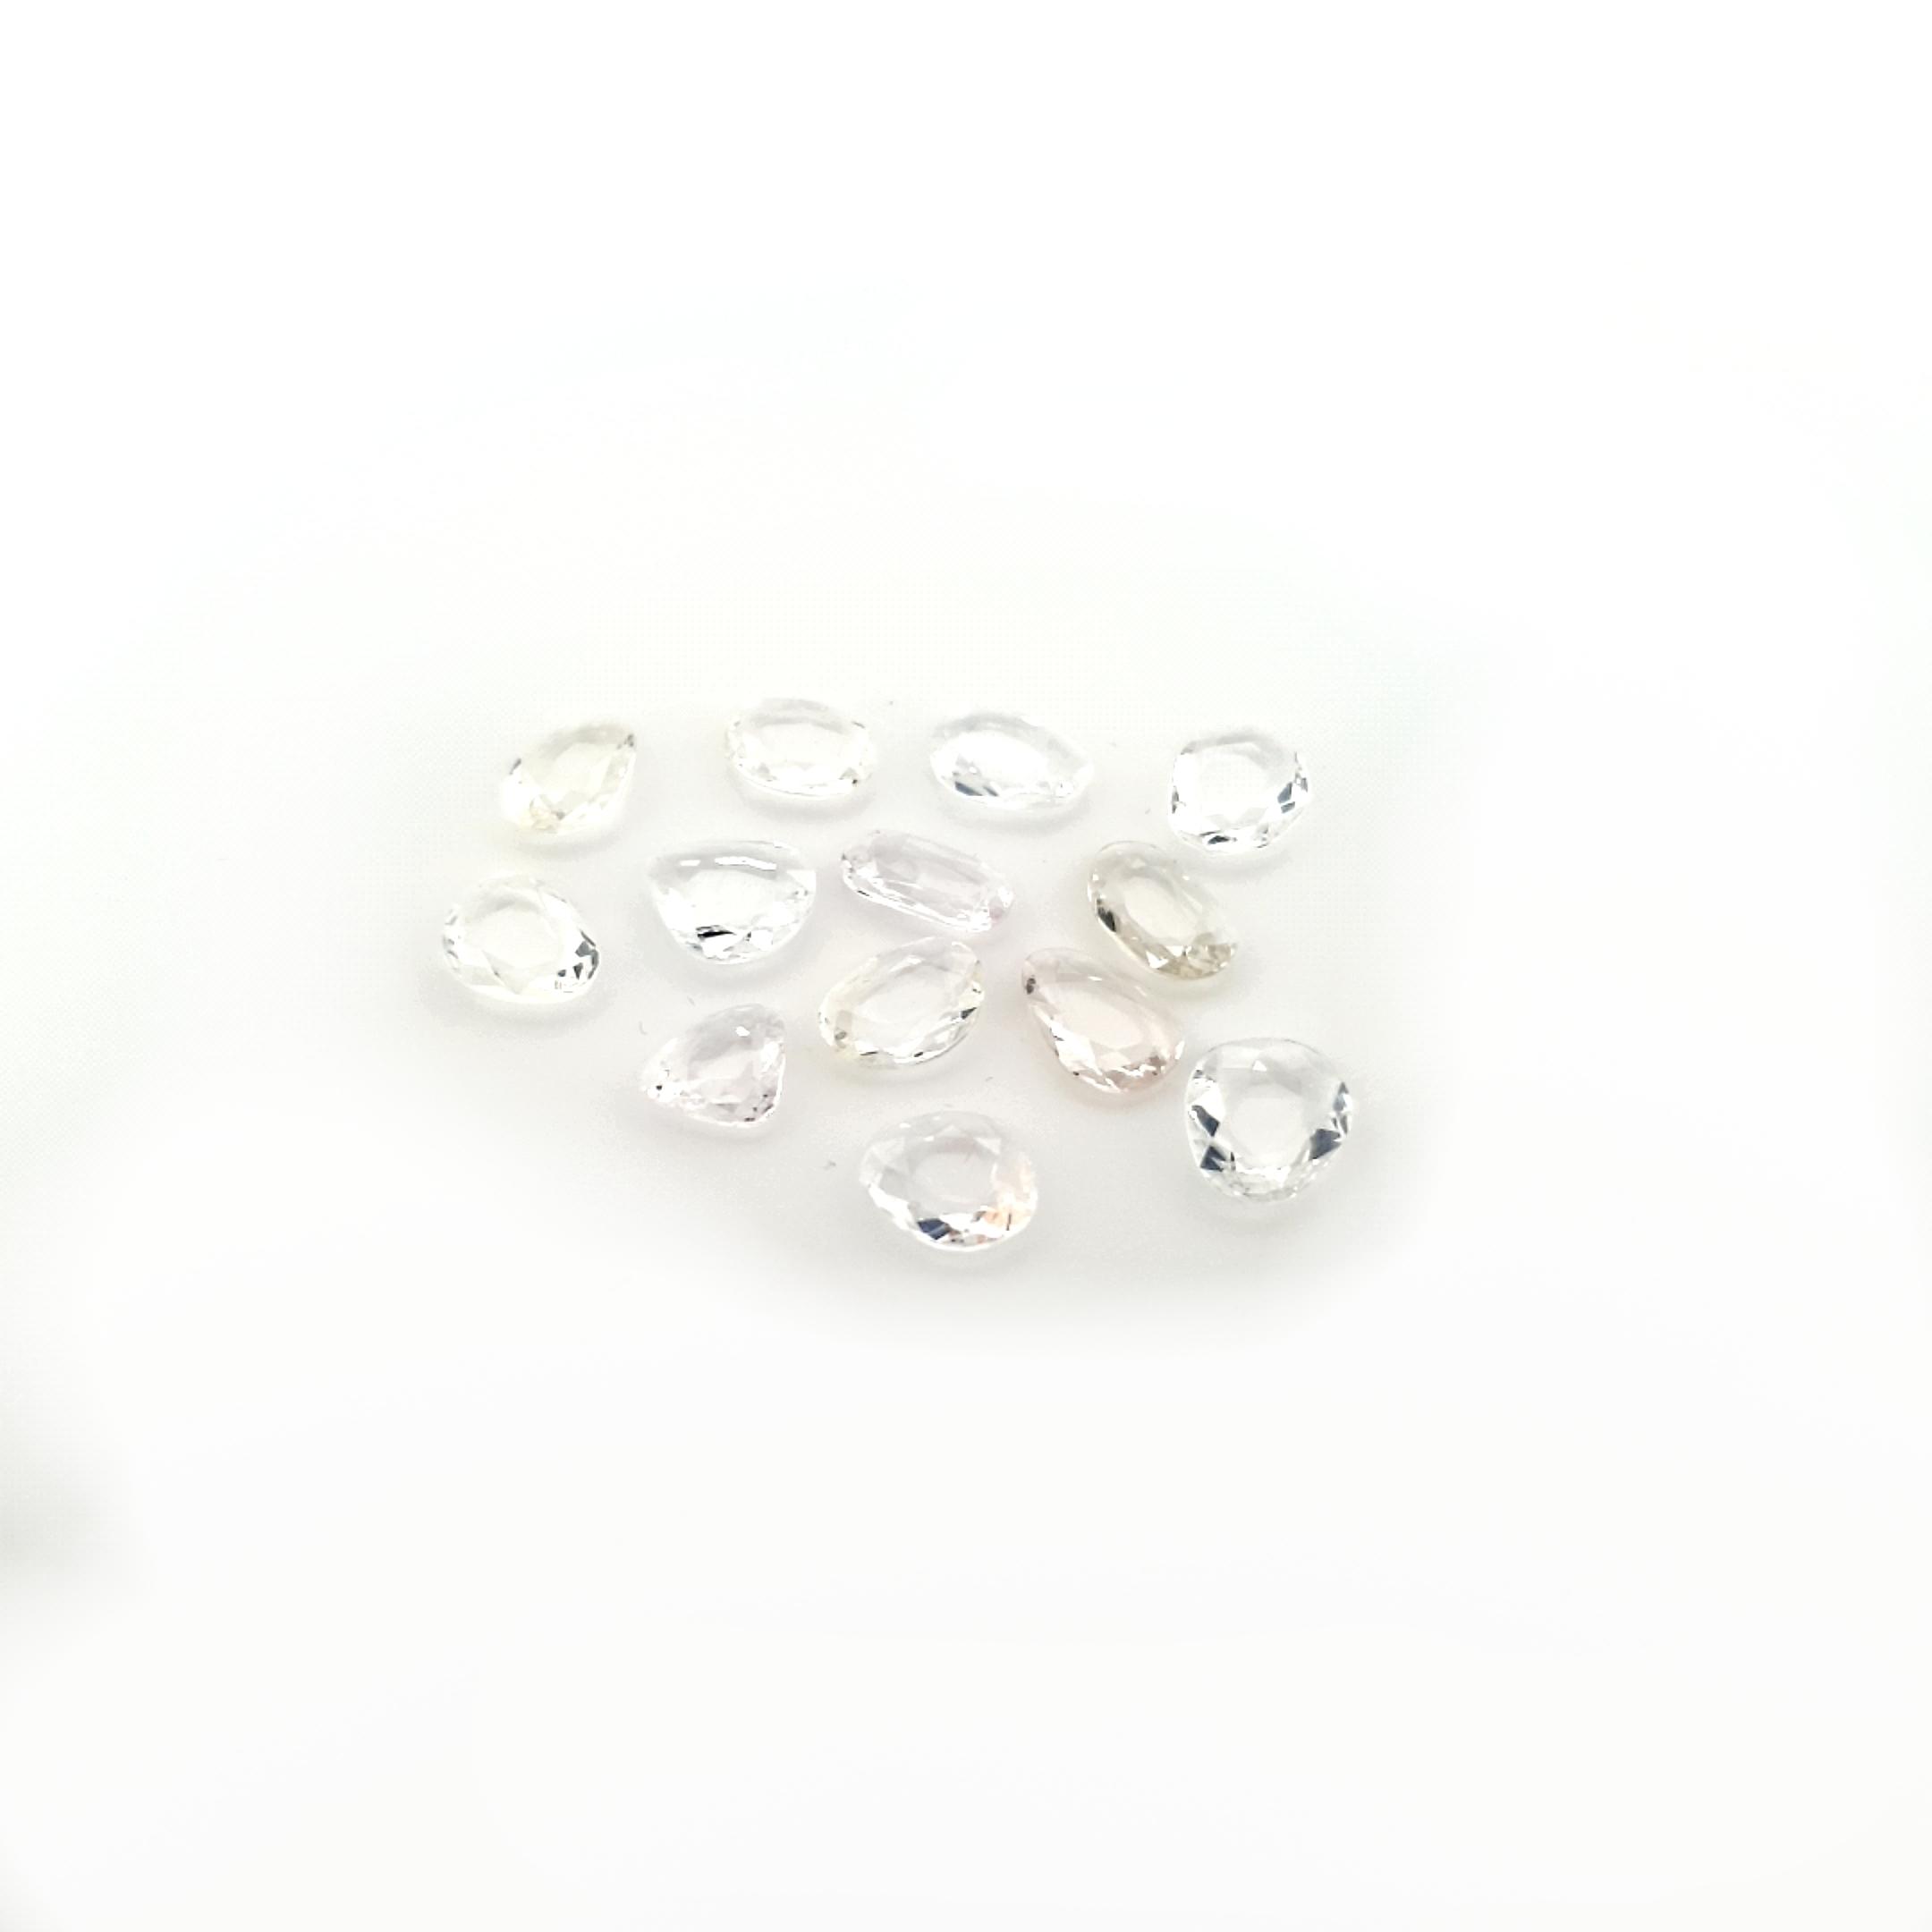 1,00-1,50ct.size-WhiteSapphire-DoubleRoseCut-SFC11C6-ClaudiaHamann__2021-02-01-21-52-30